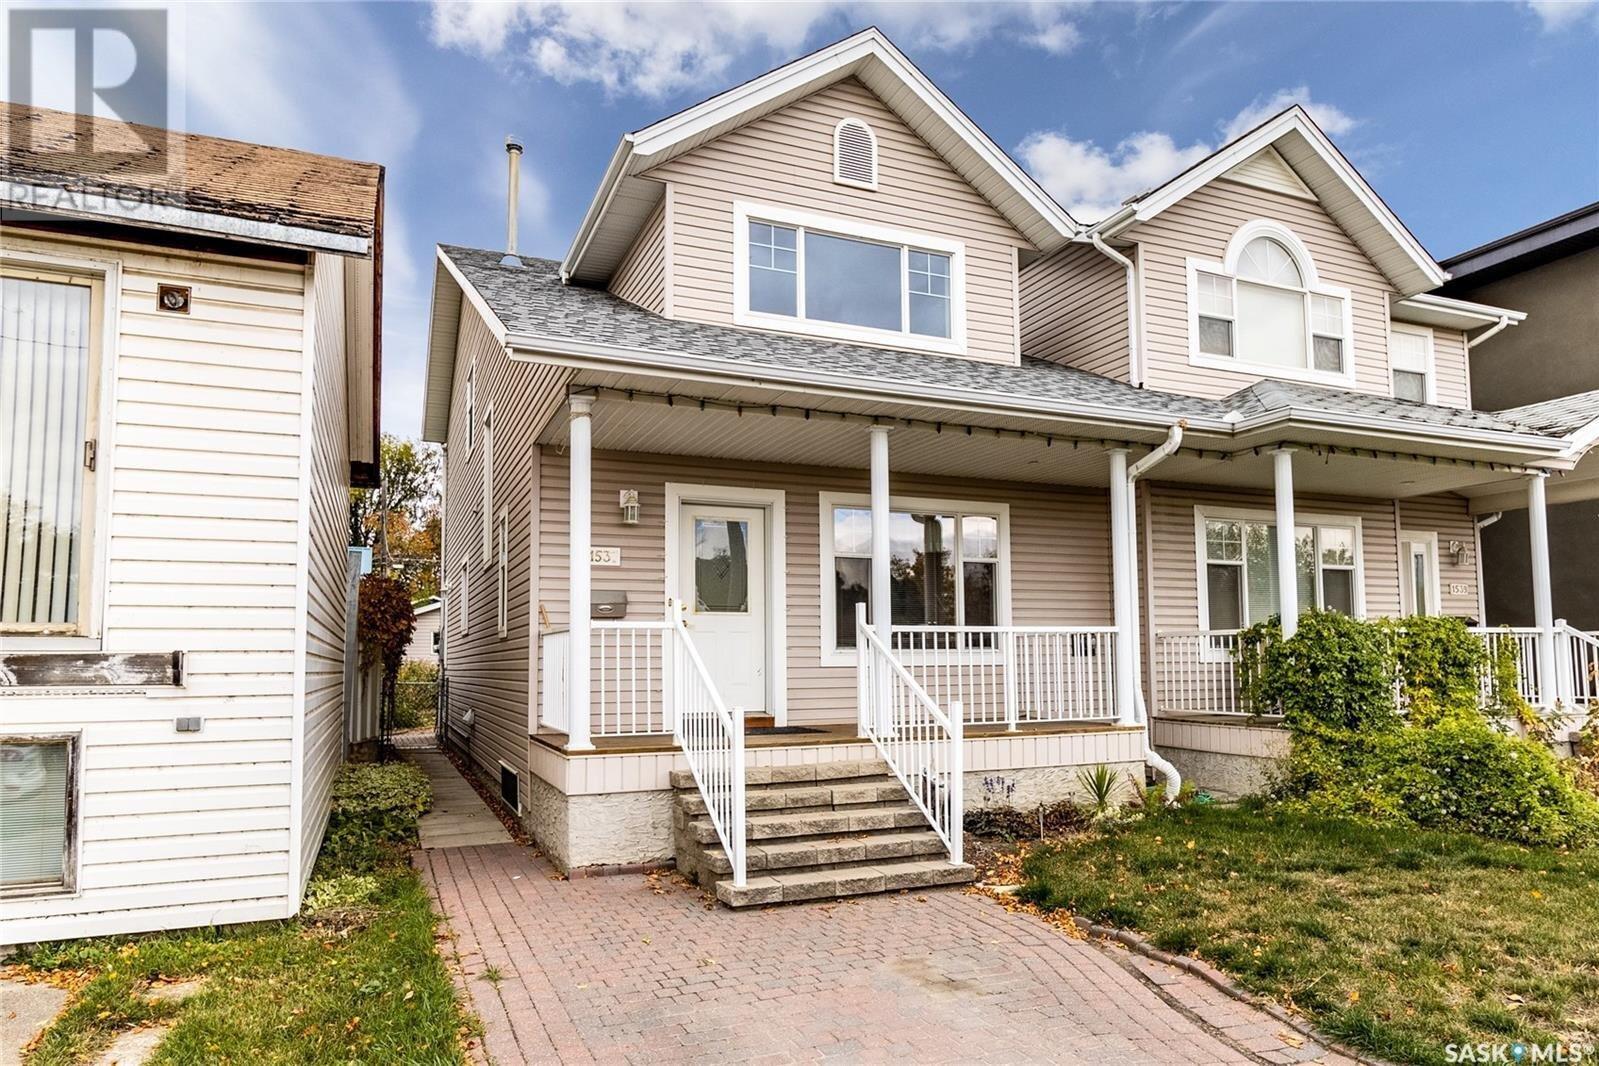 House for sale at 1537 Spadina Cres E Saskatoon Saskatchewan - MLS: SK828069